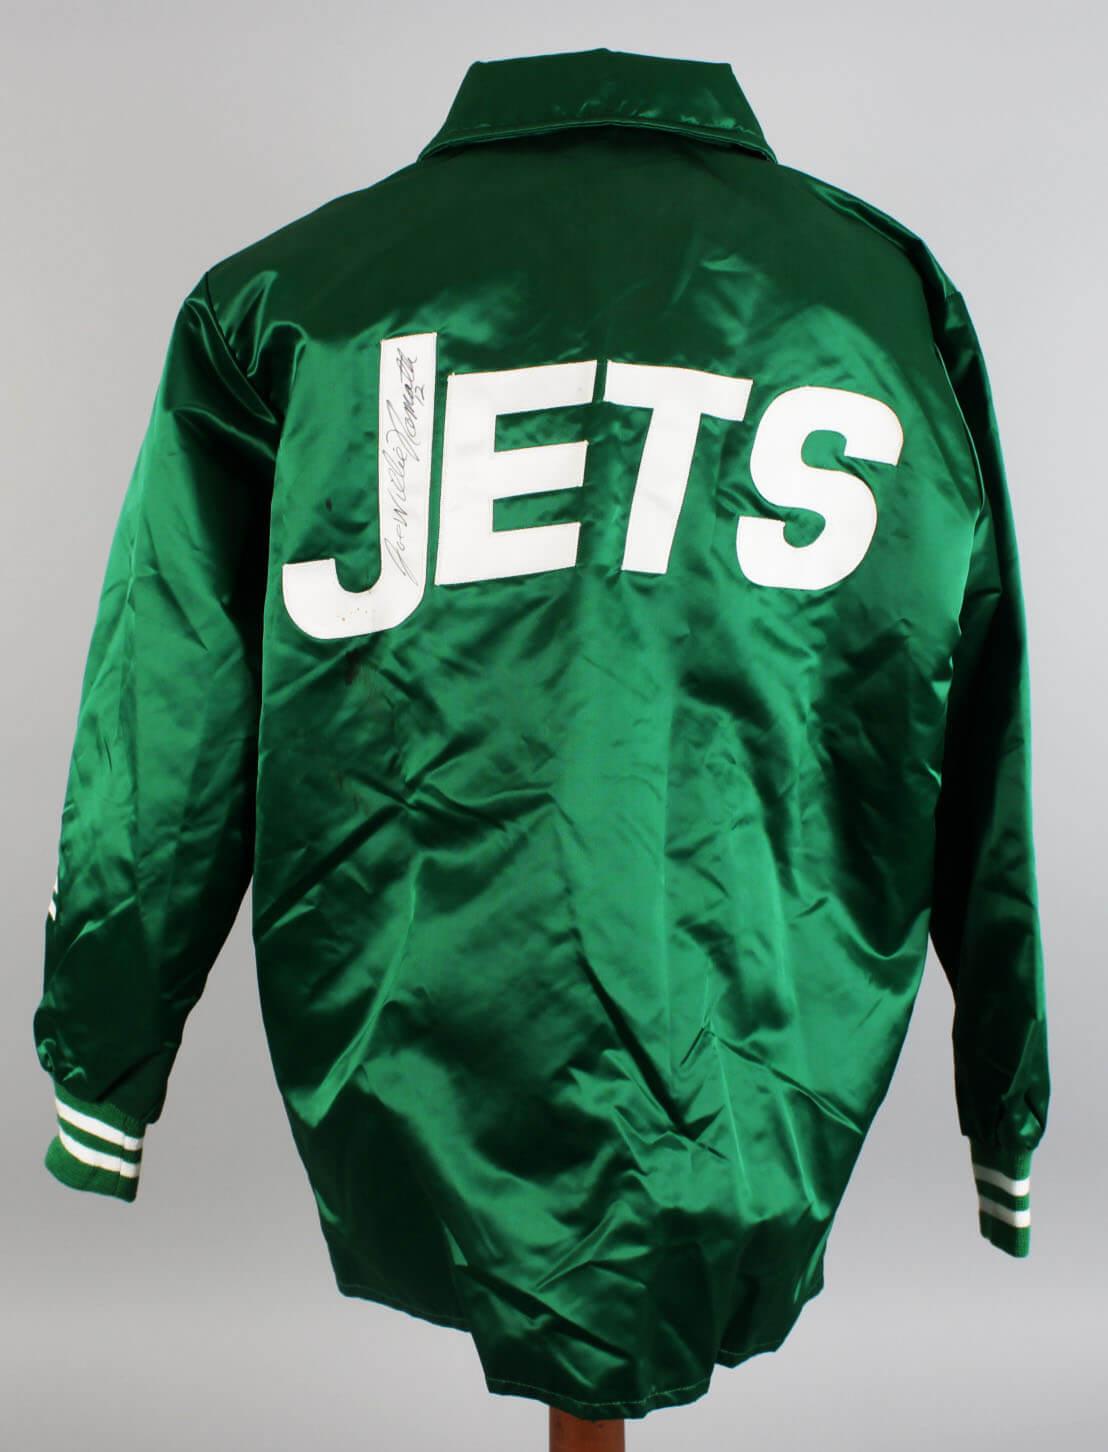 1969 New York Jets – Joe Namath Game-Worn, Signed Jacket from Super Bowl Season (JSA)57420_01